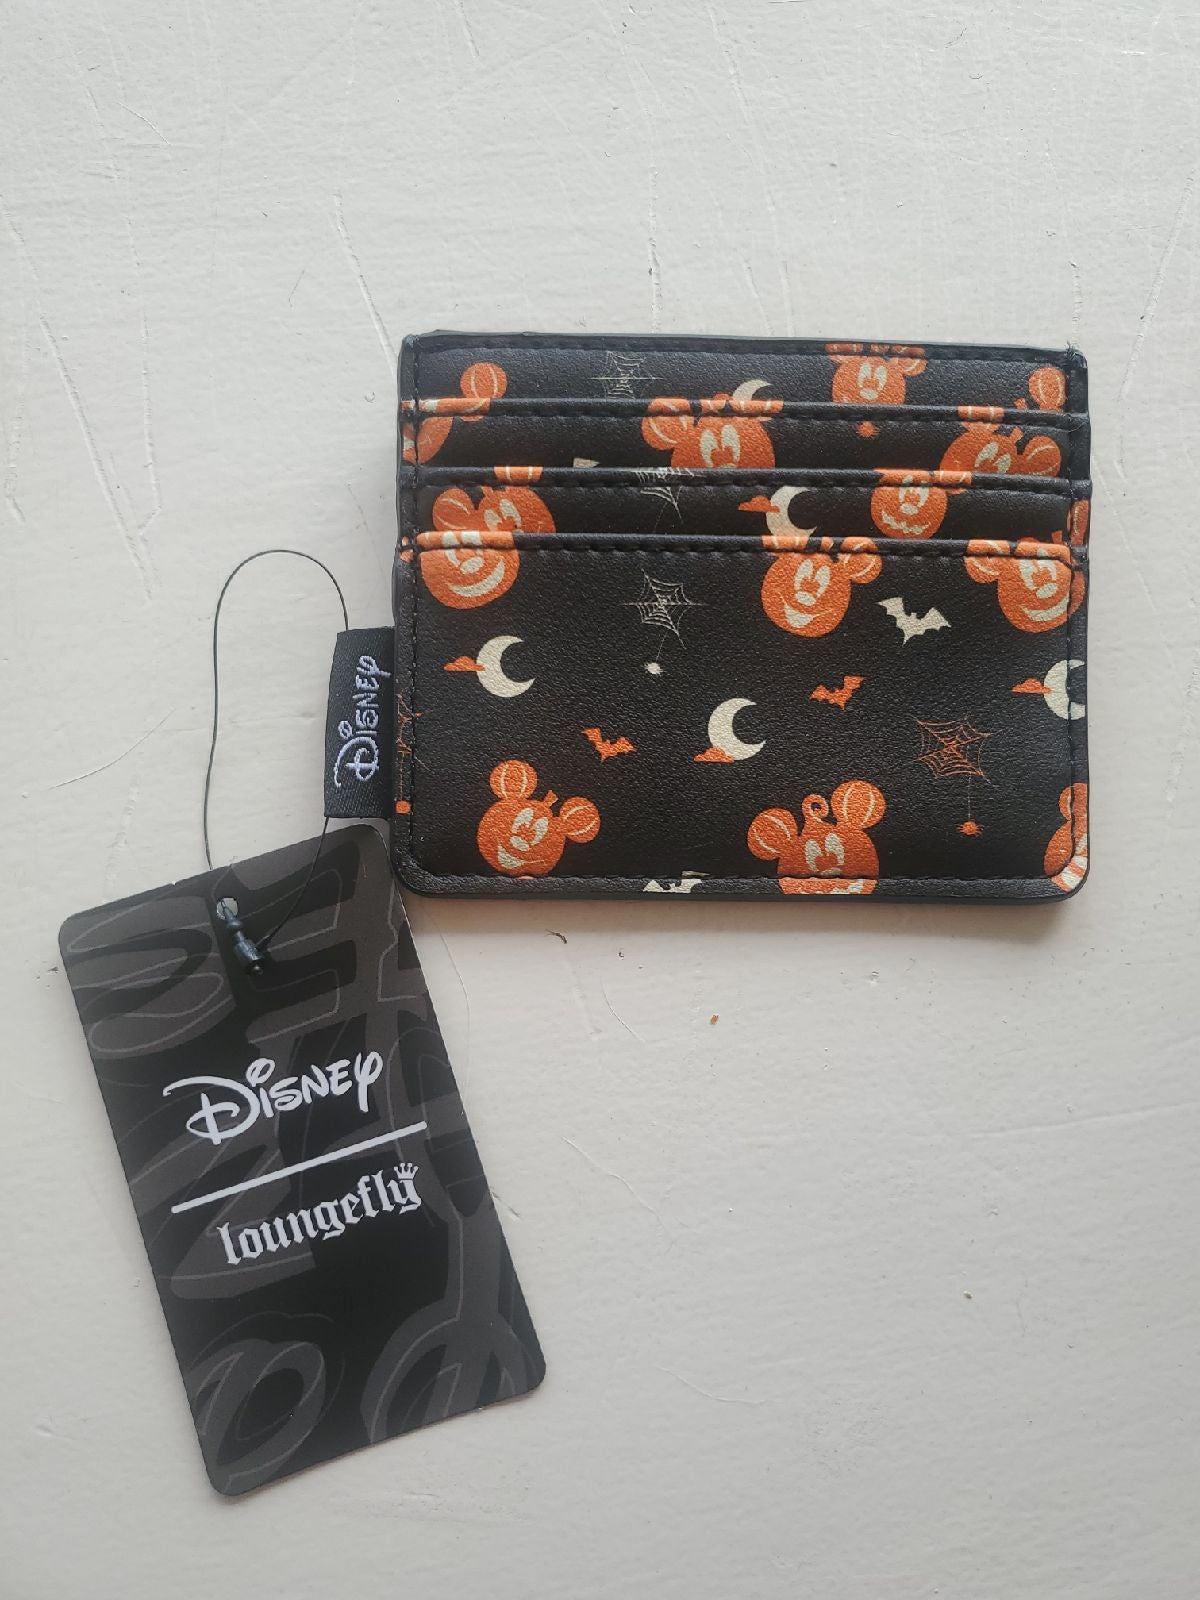 Loungefly Halloween pumpkin cardholder